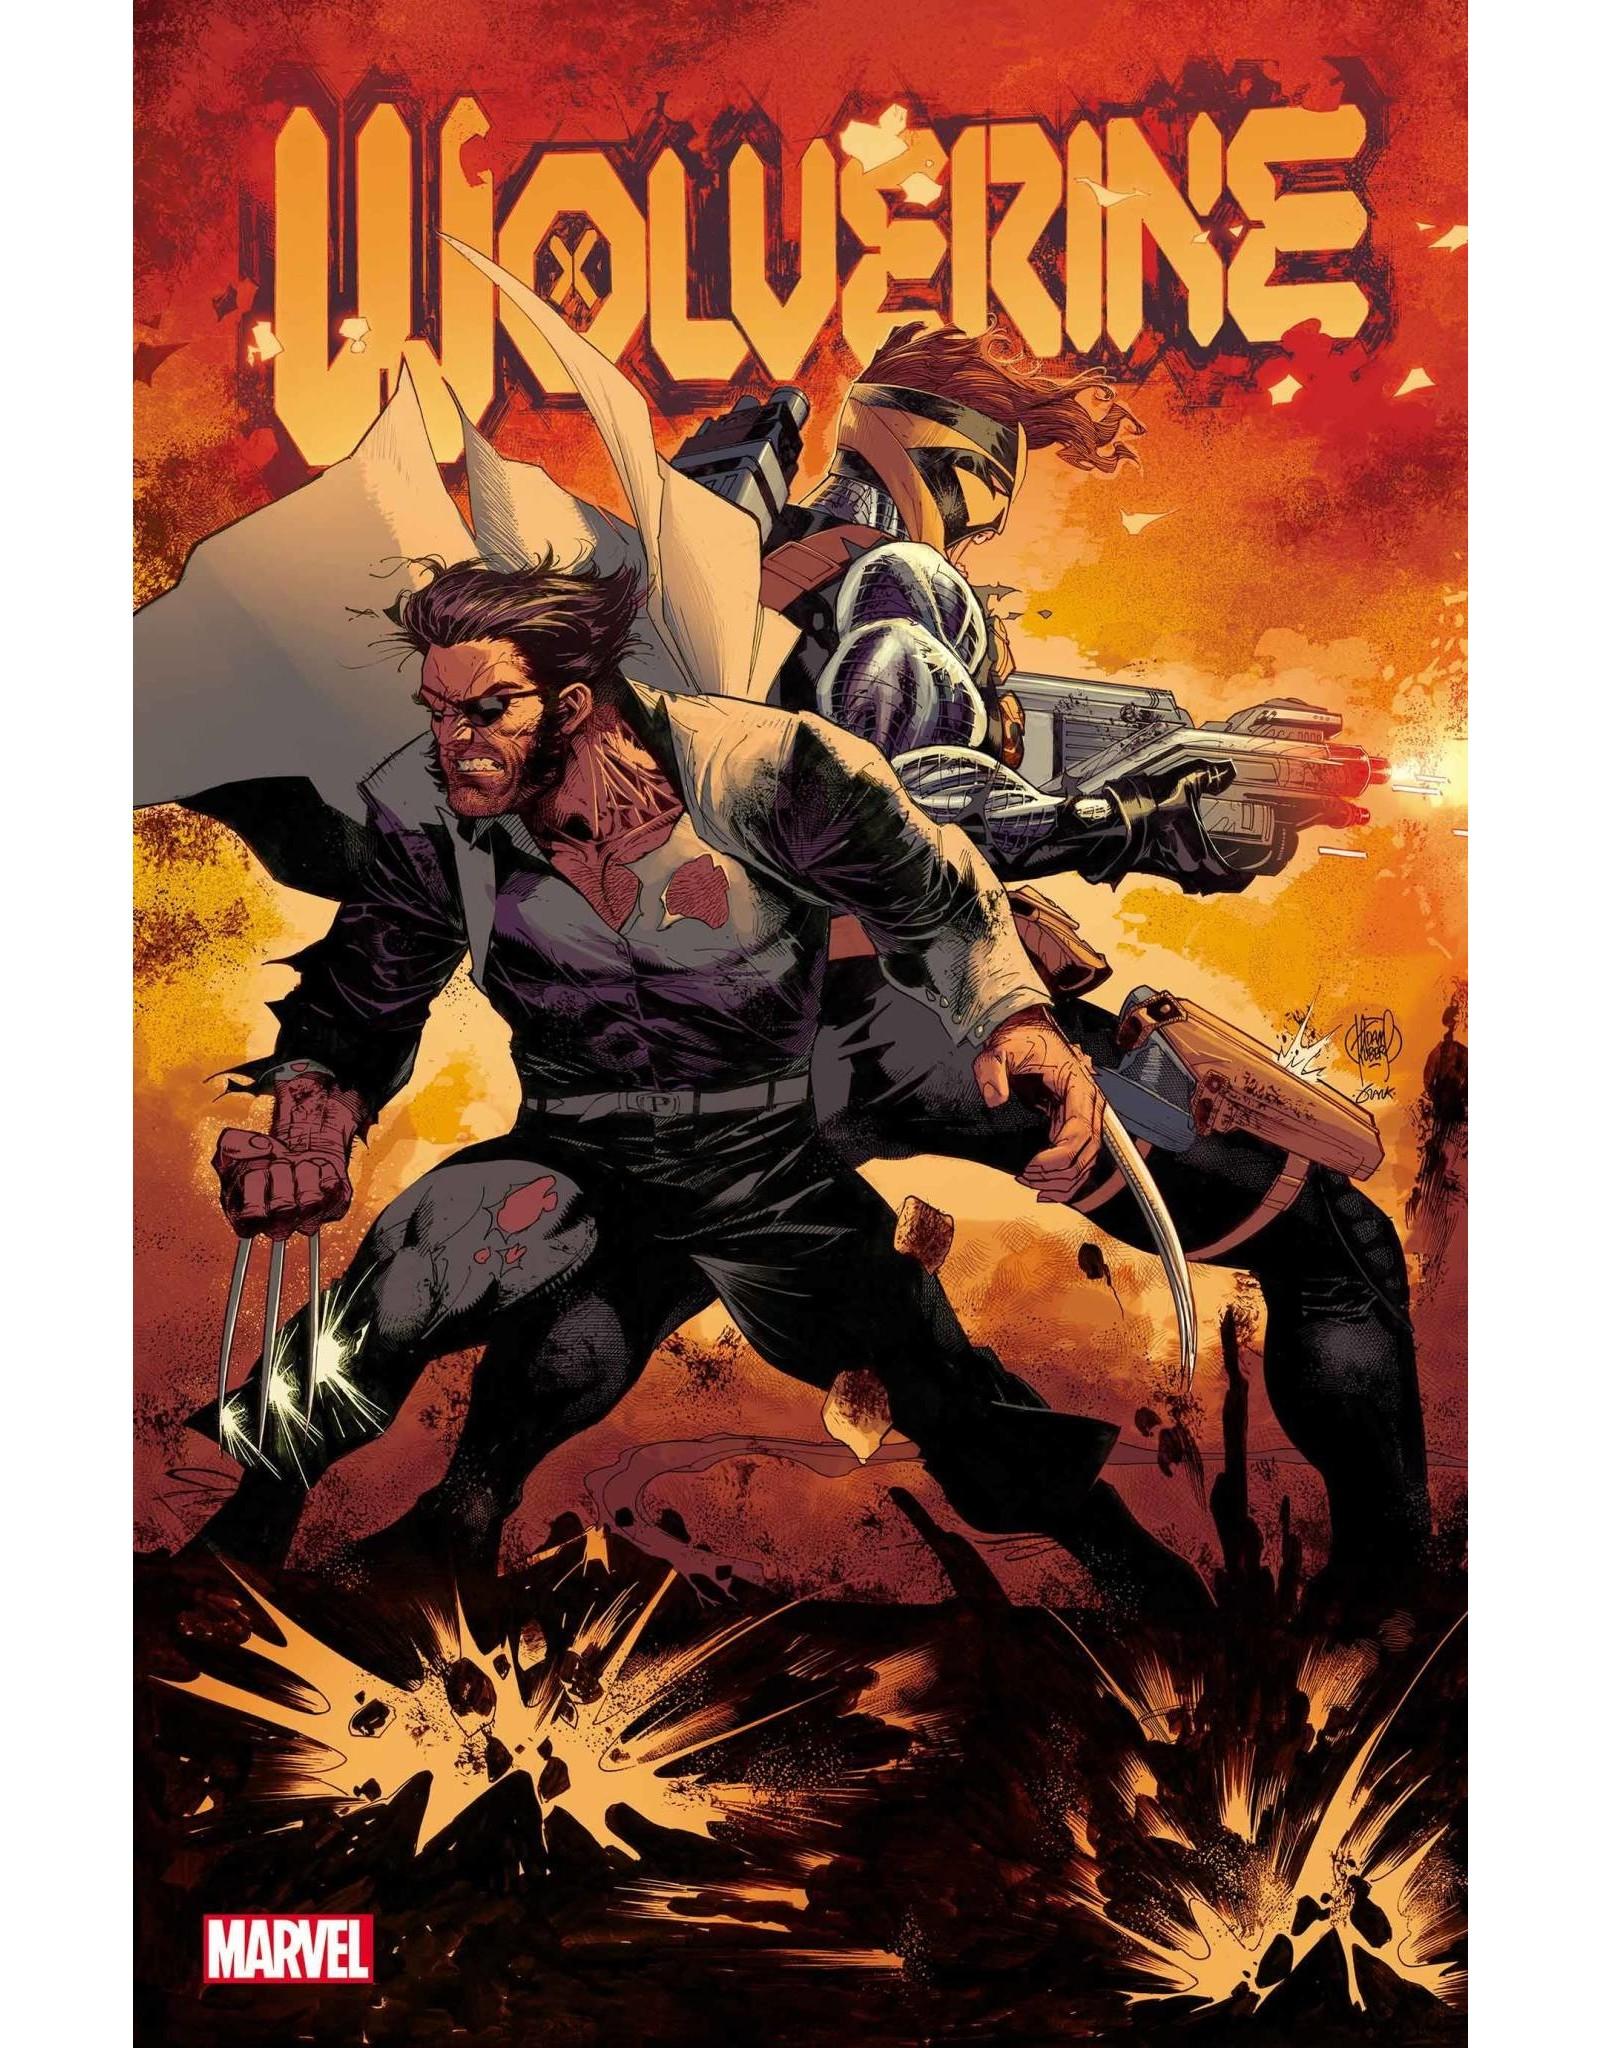 Marvel Comics WOLVERINE #10